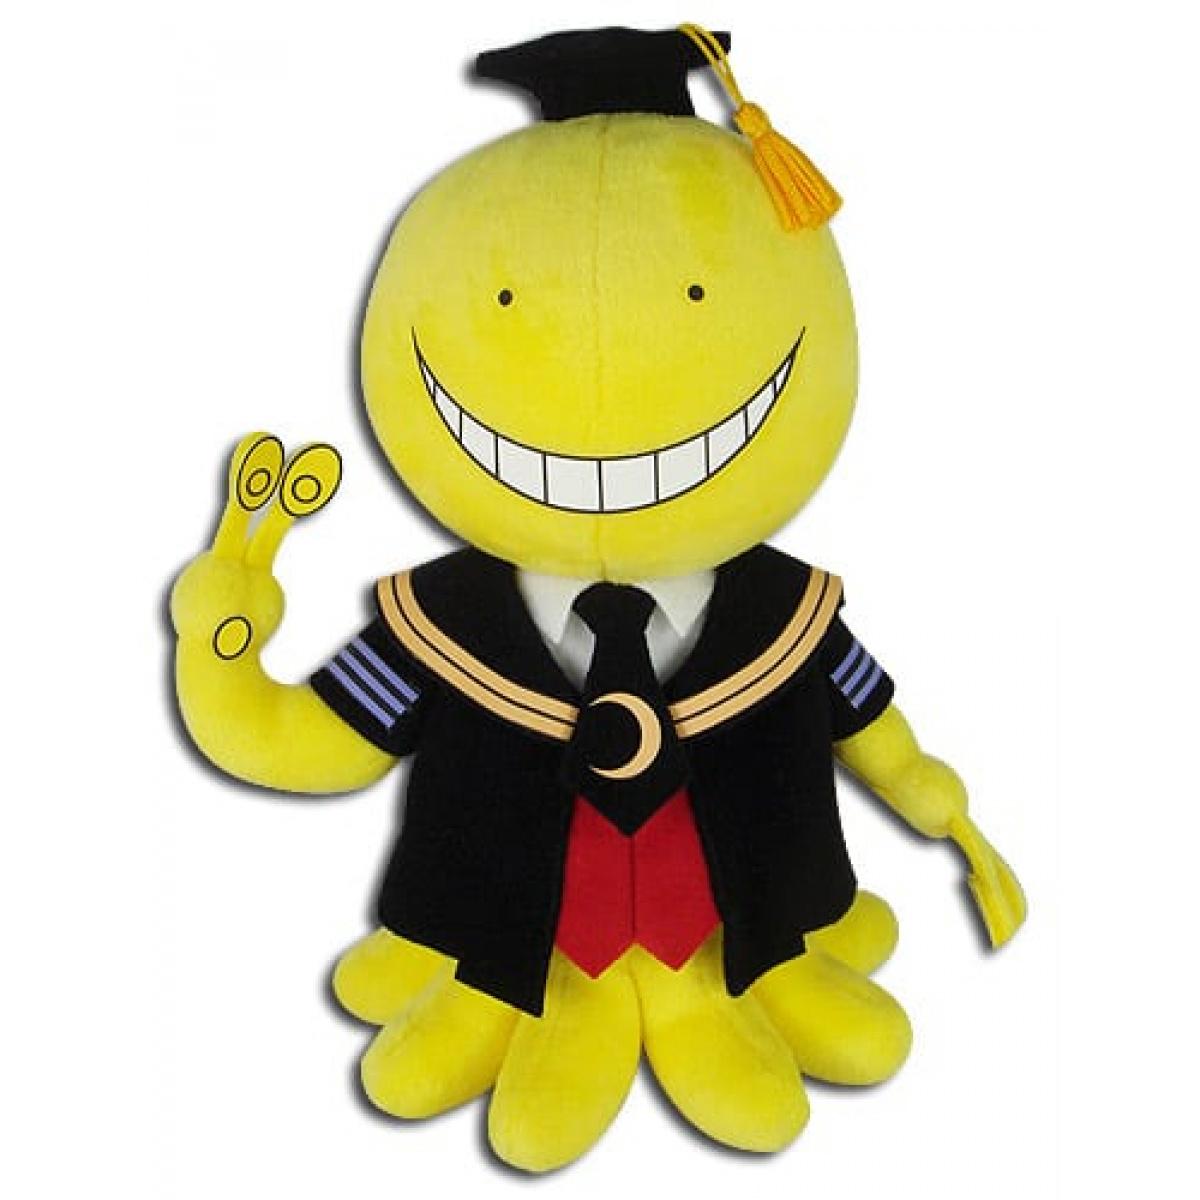 "Assassination Classroom Koro-Sensei 8"" Plush Anime Plushies 4"